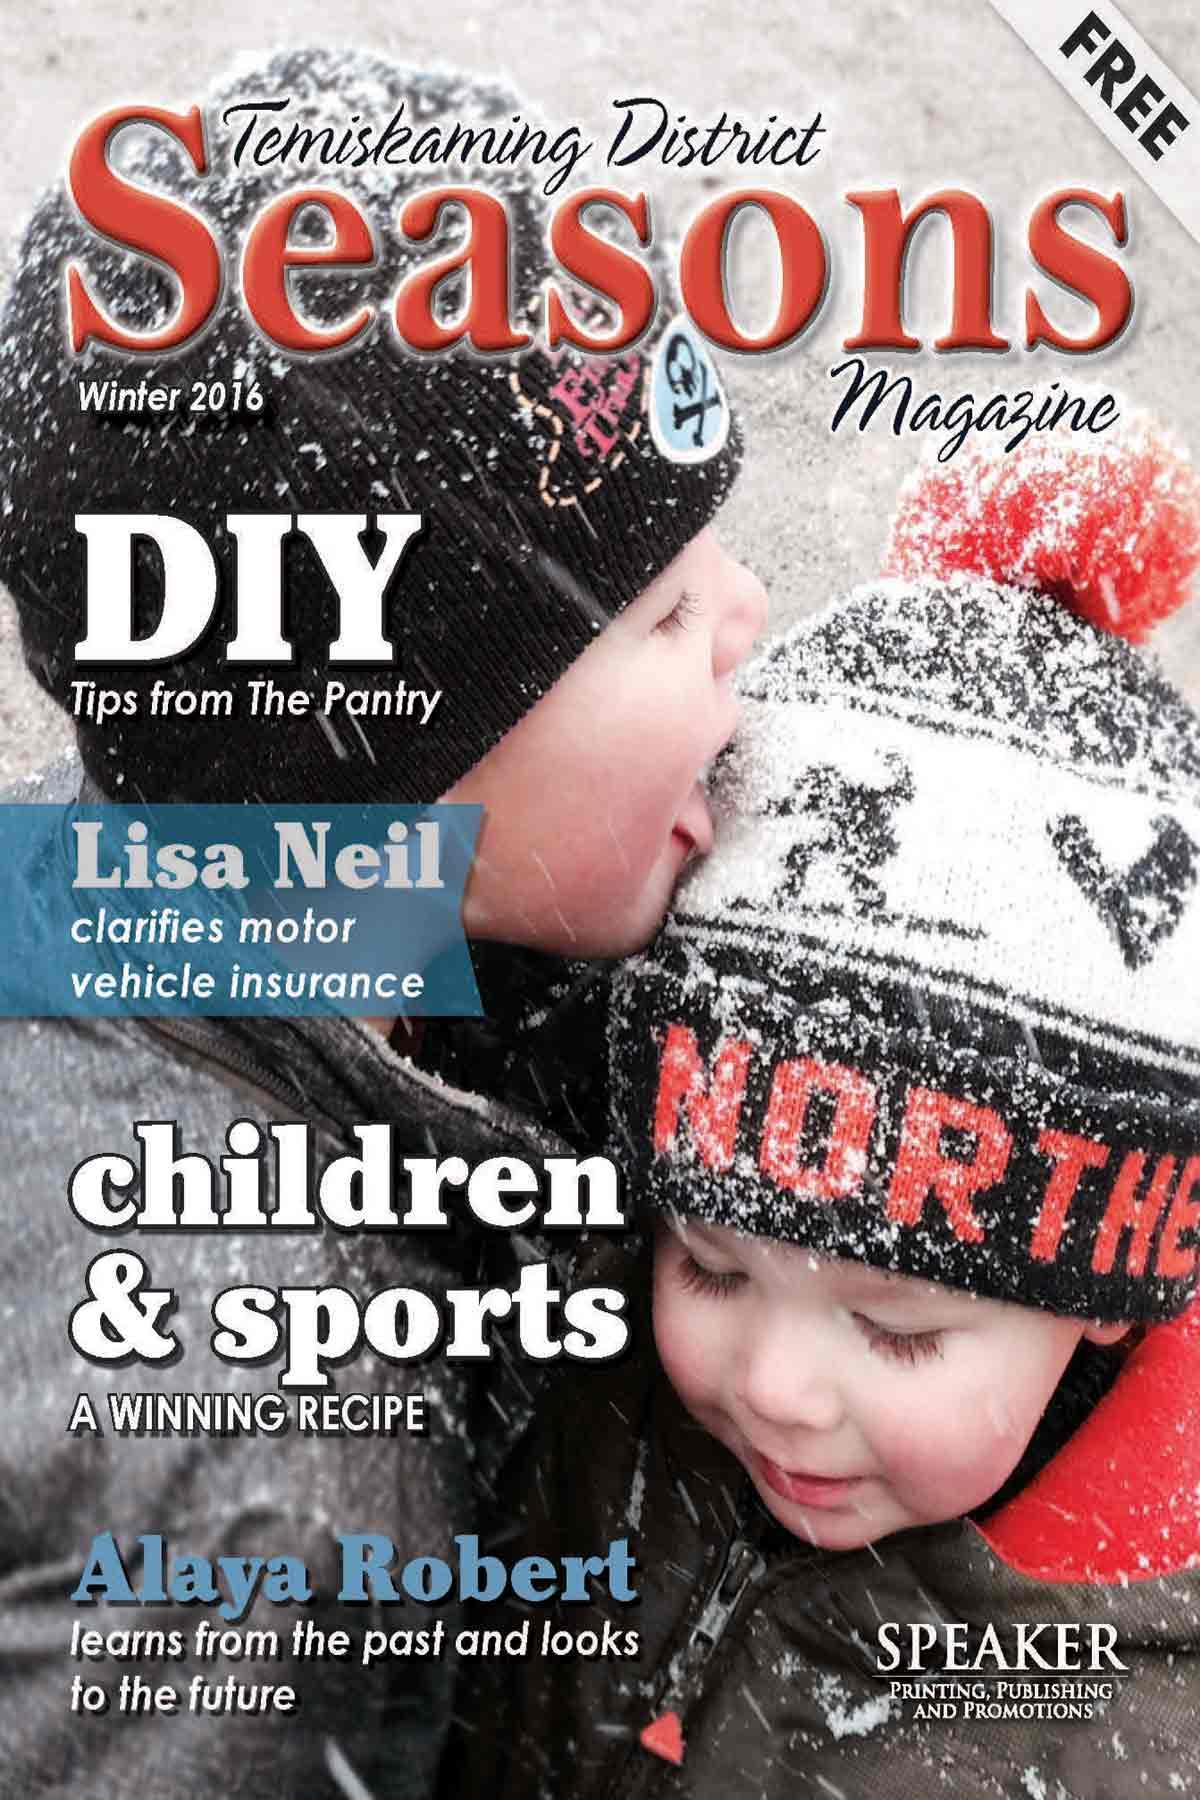 Northern Ontario News - The Temiskaming Speaker - Seasons Magazine